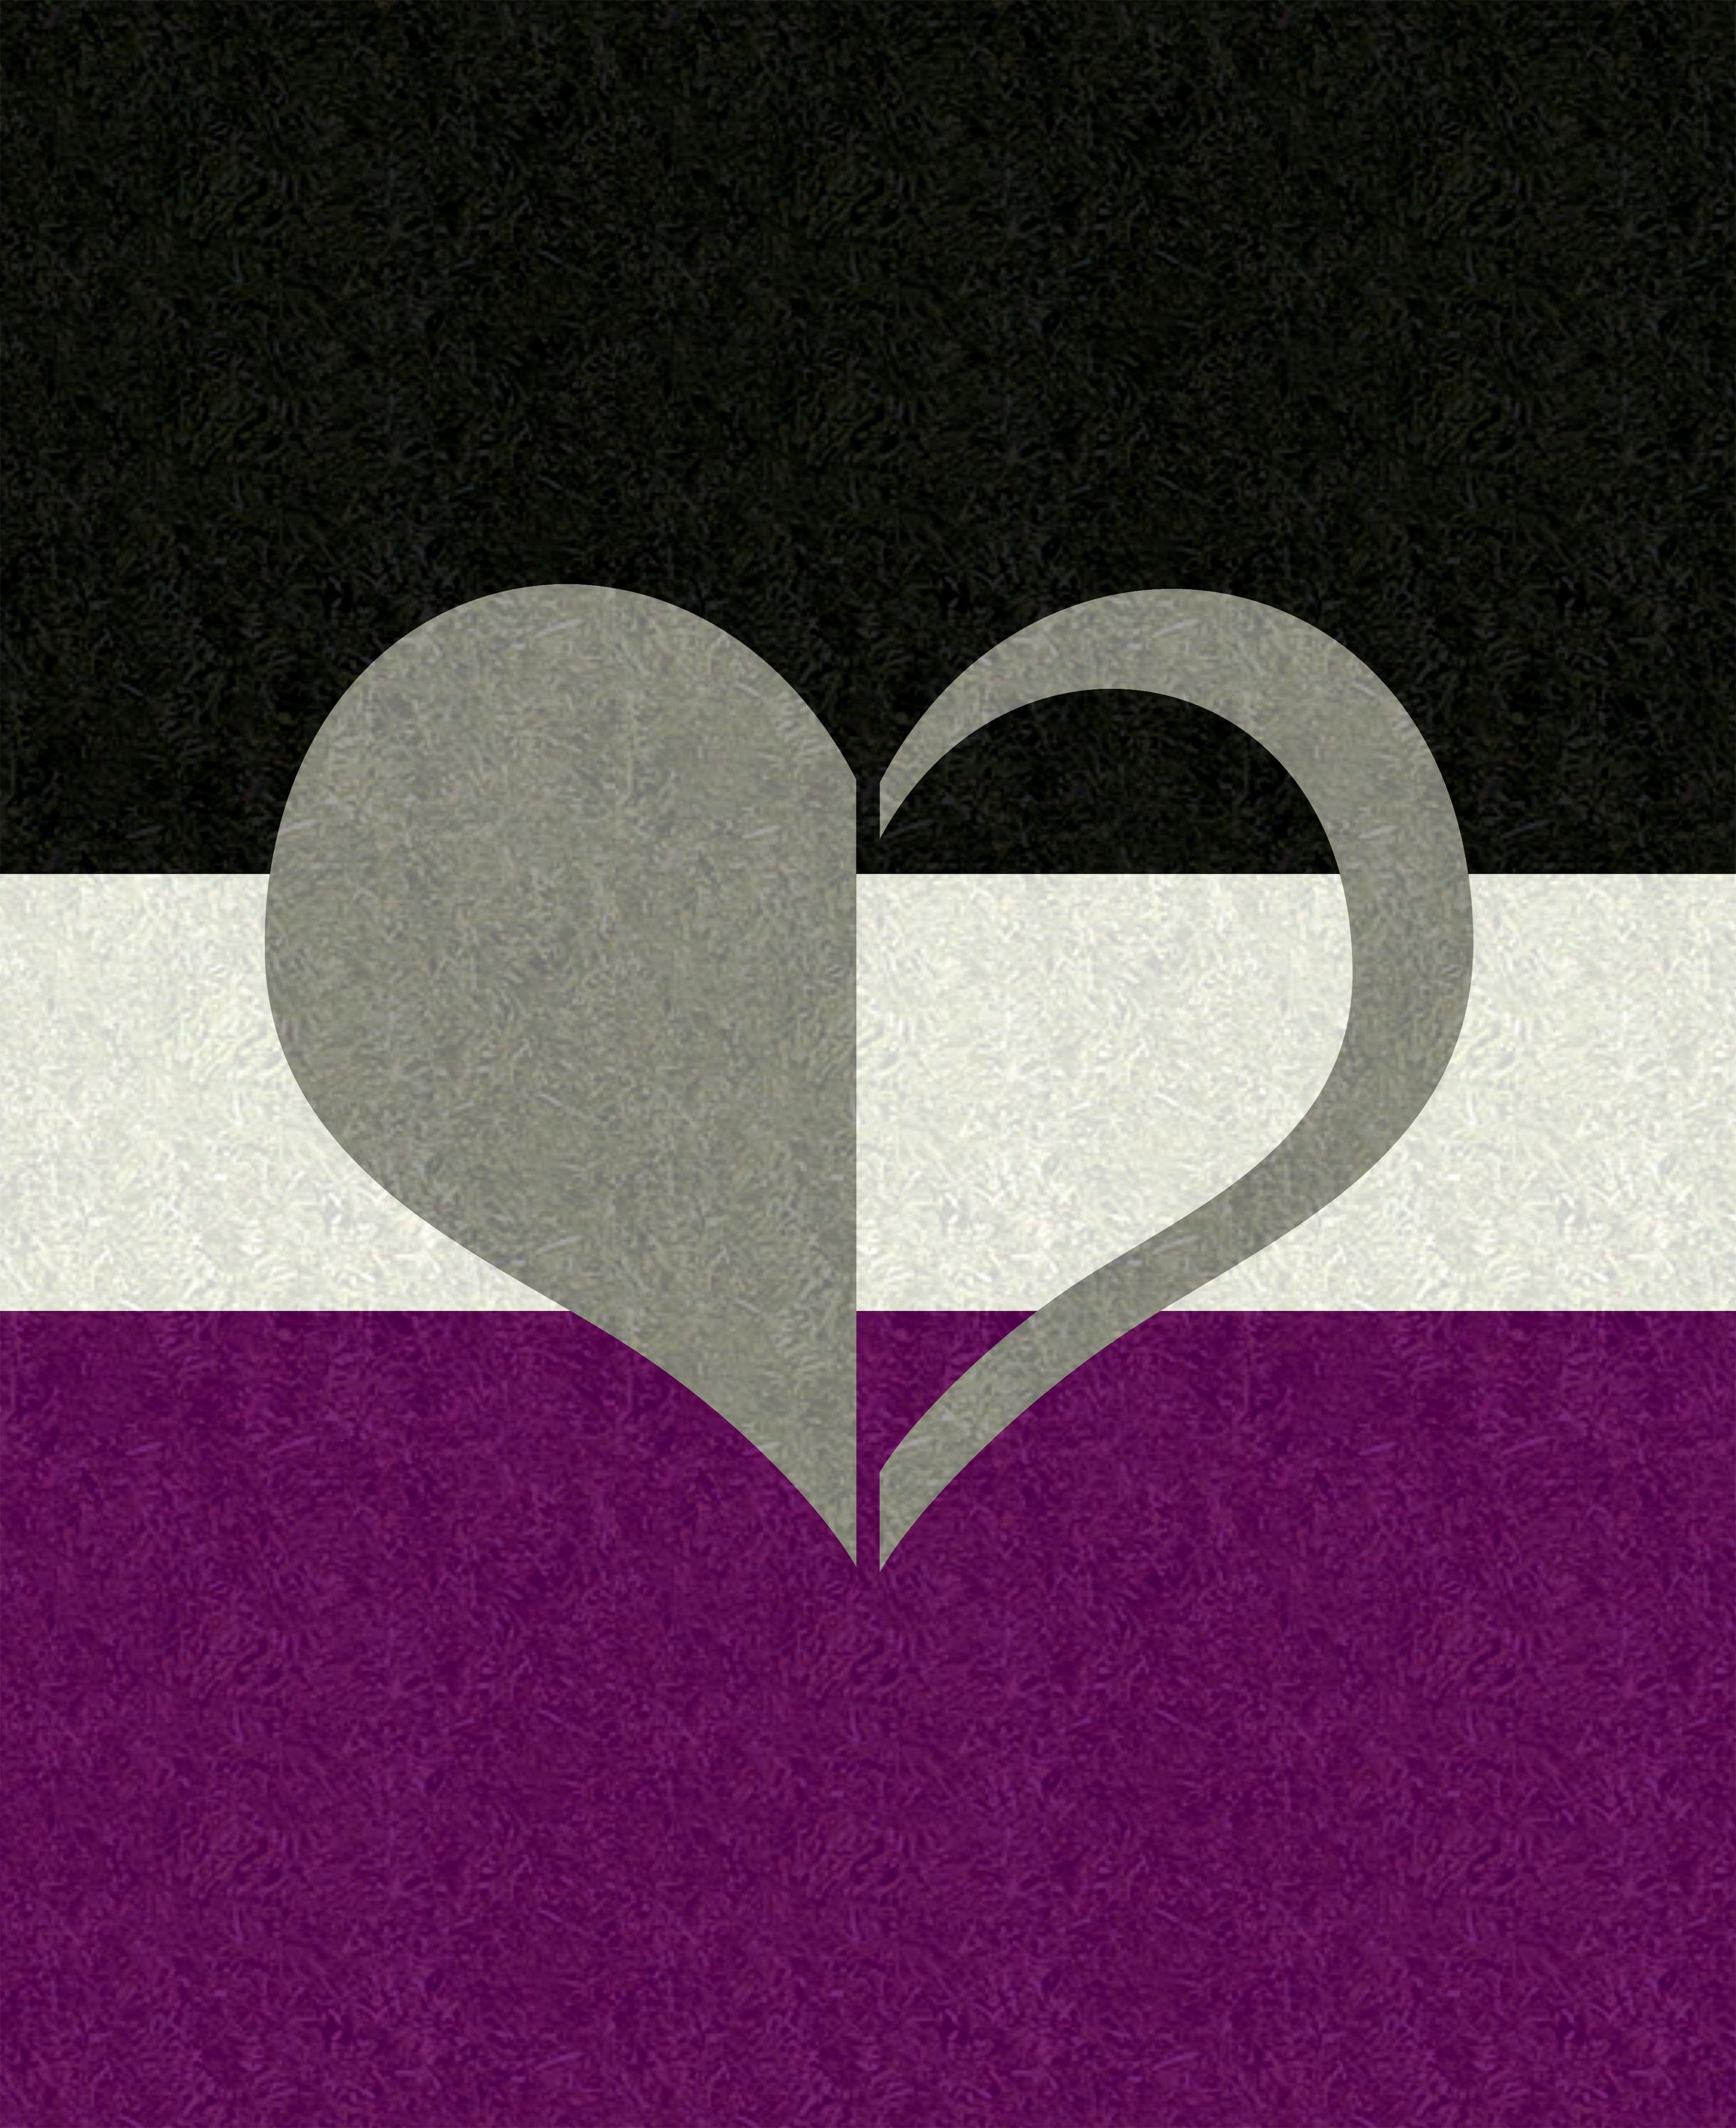 Customizable greyromantic pride flag black white and purple customizable greyromantic pride flag black white and purple flag with gray heart symbol buycottarizona